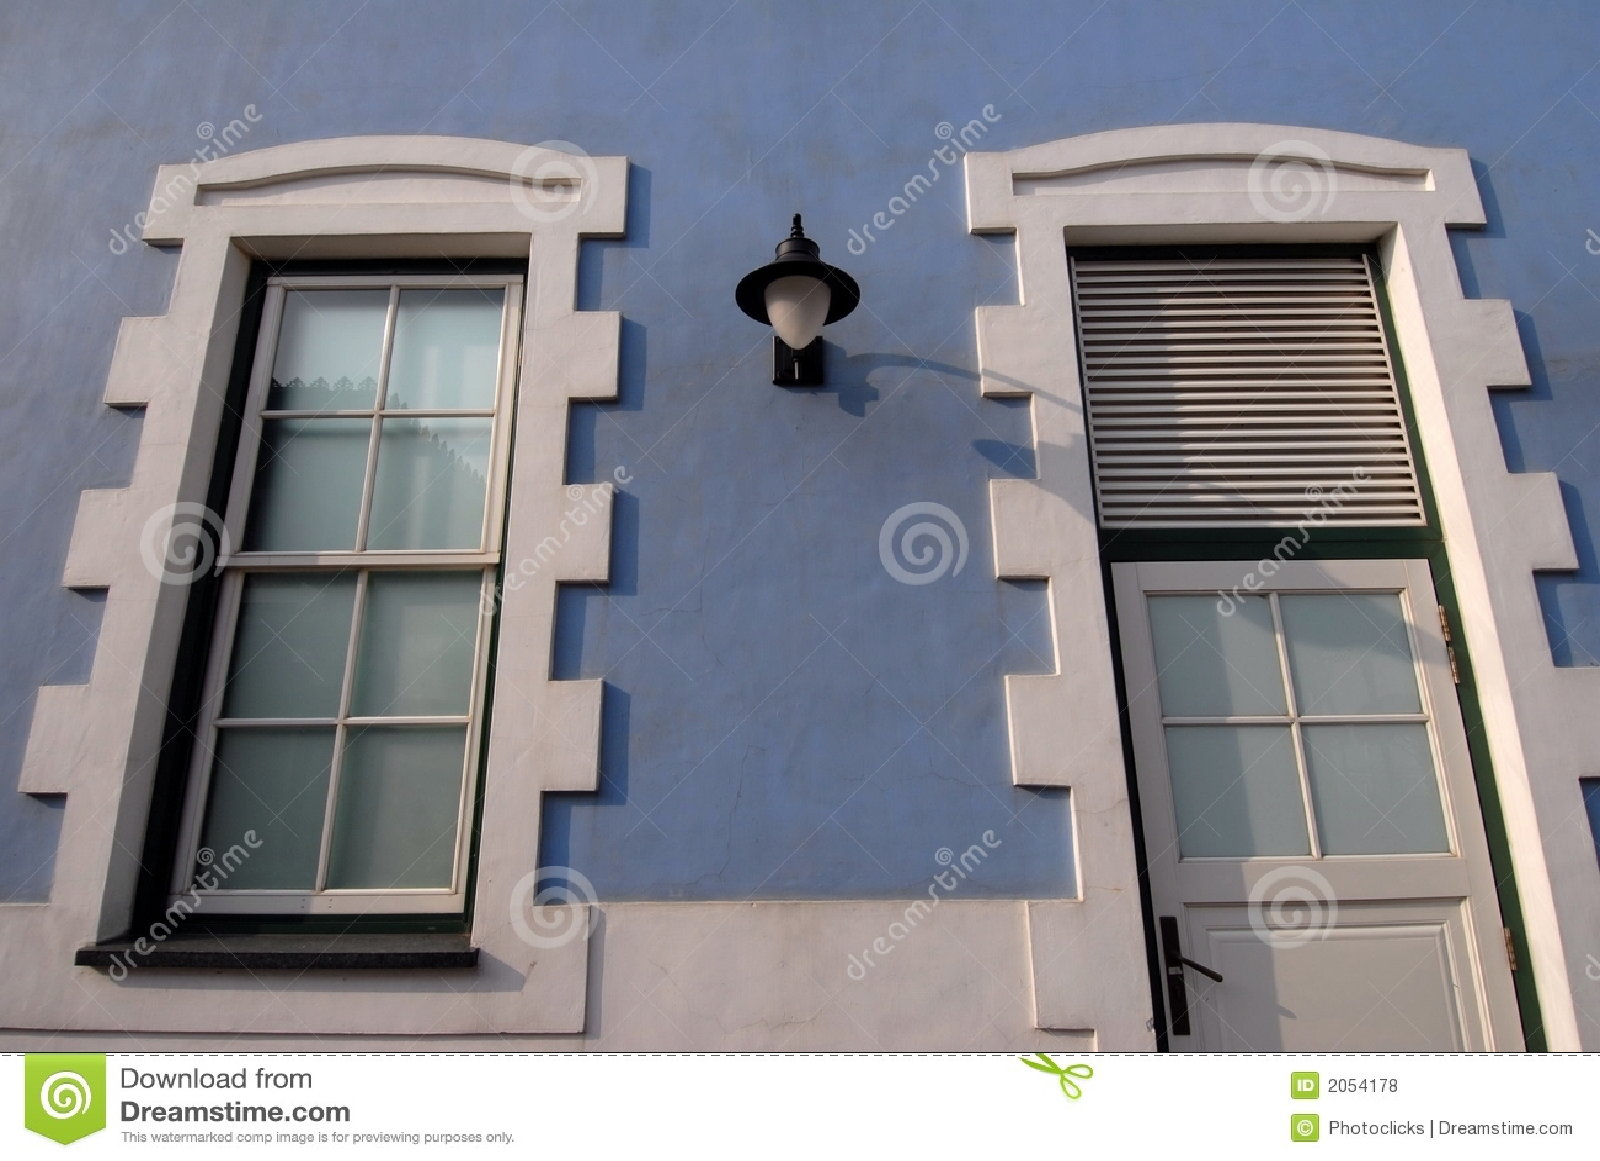 голубой внешний дом